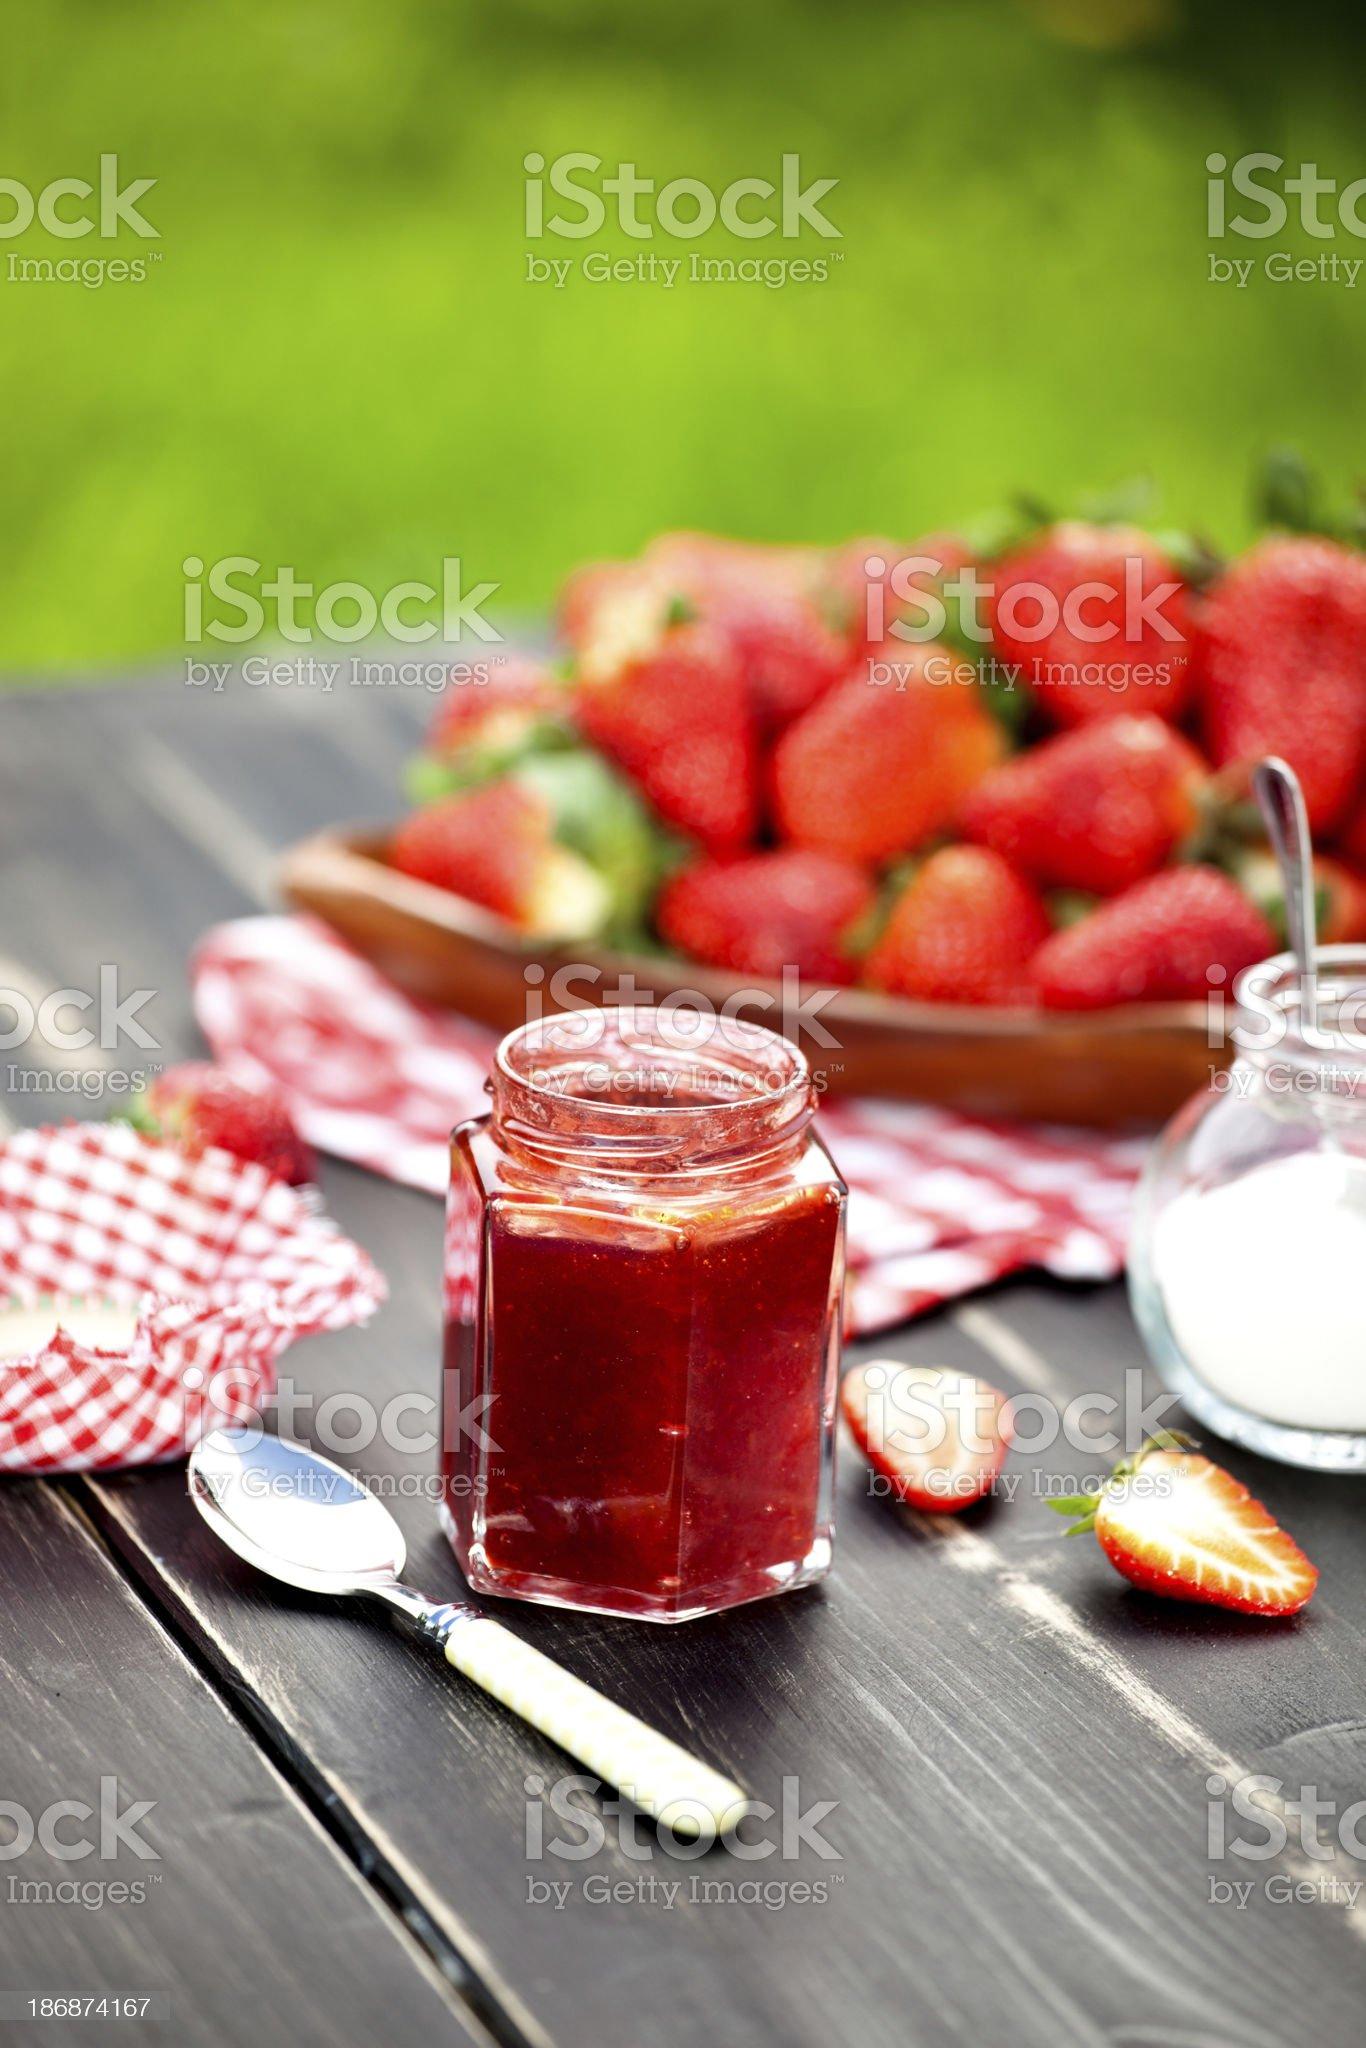 Strawberry Jam royalty-free stock photo